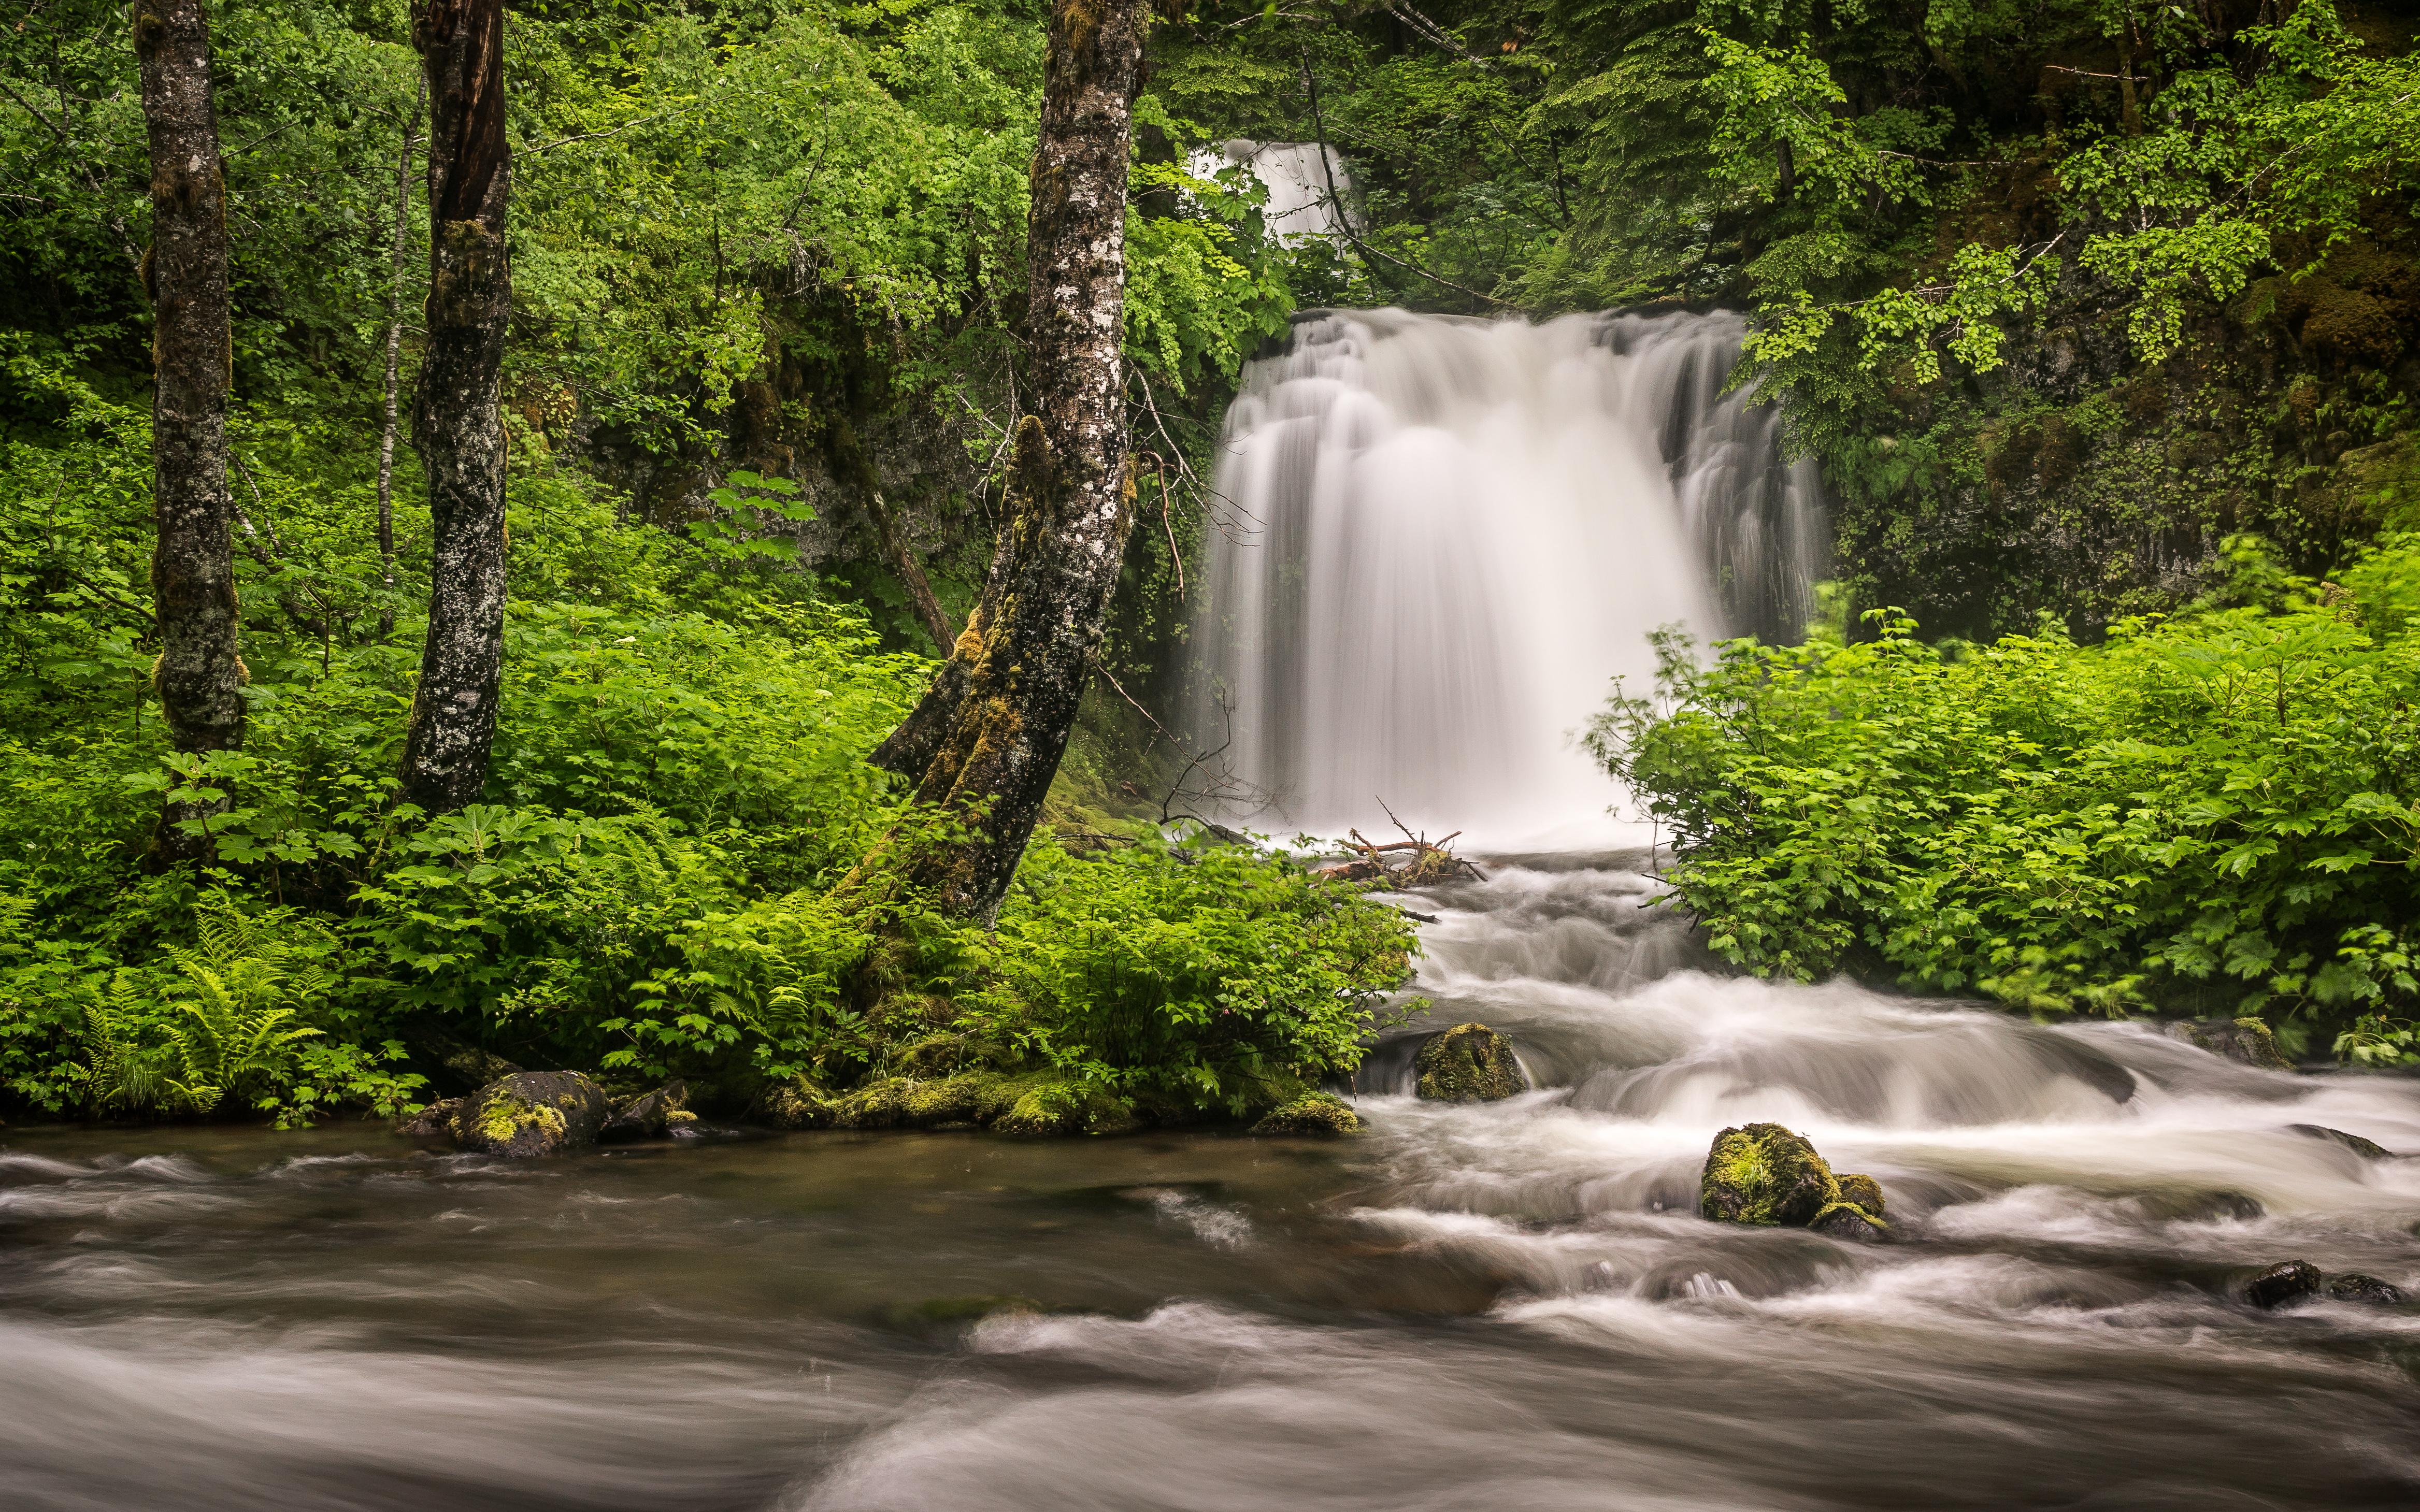 Gambar Pemandangan Pohon Alam Air Terjun Sungai Kecil Gurun